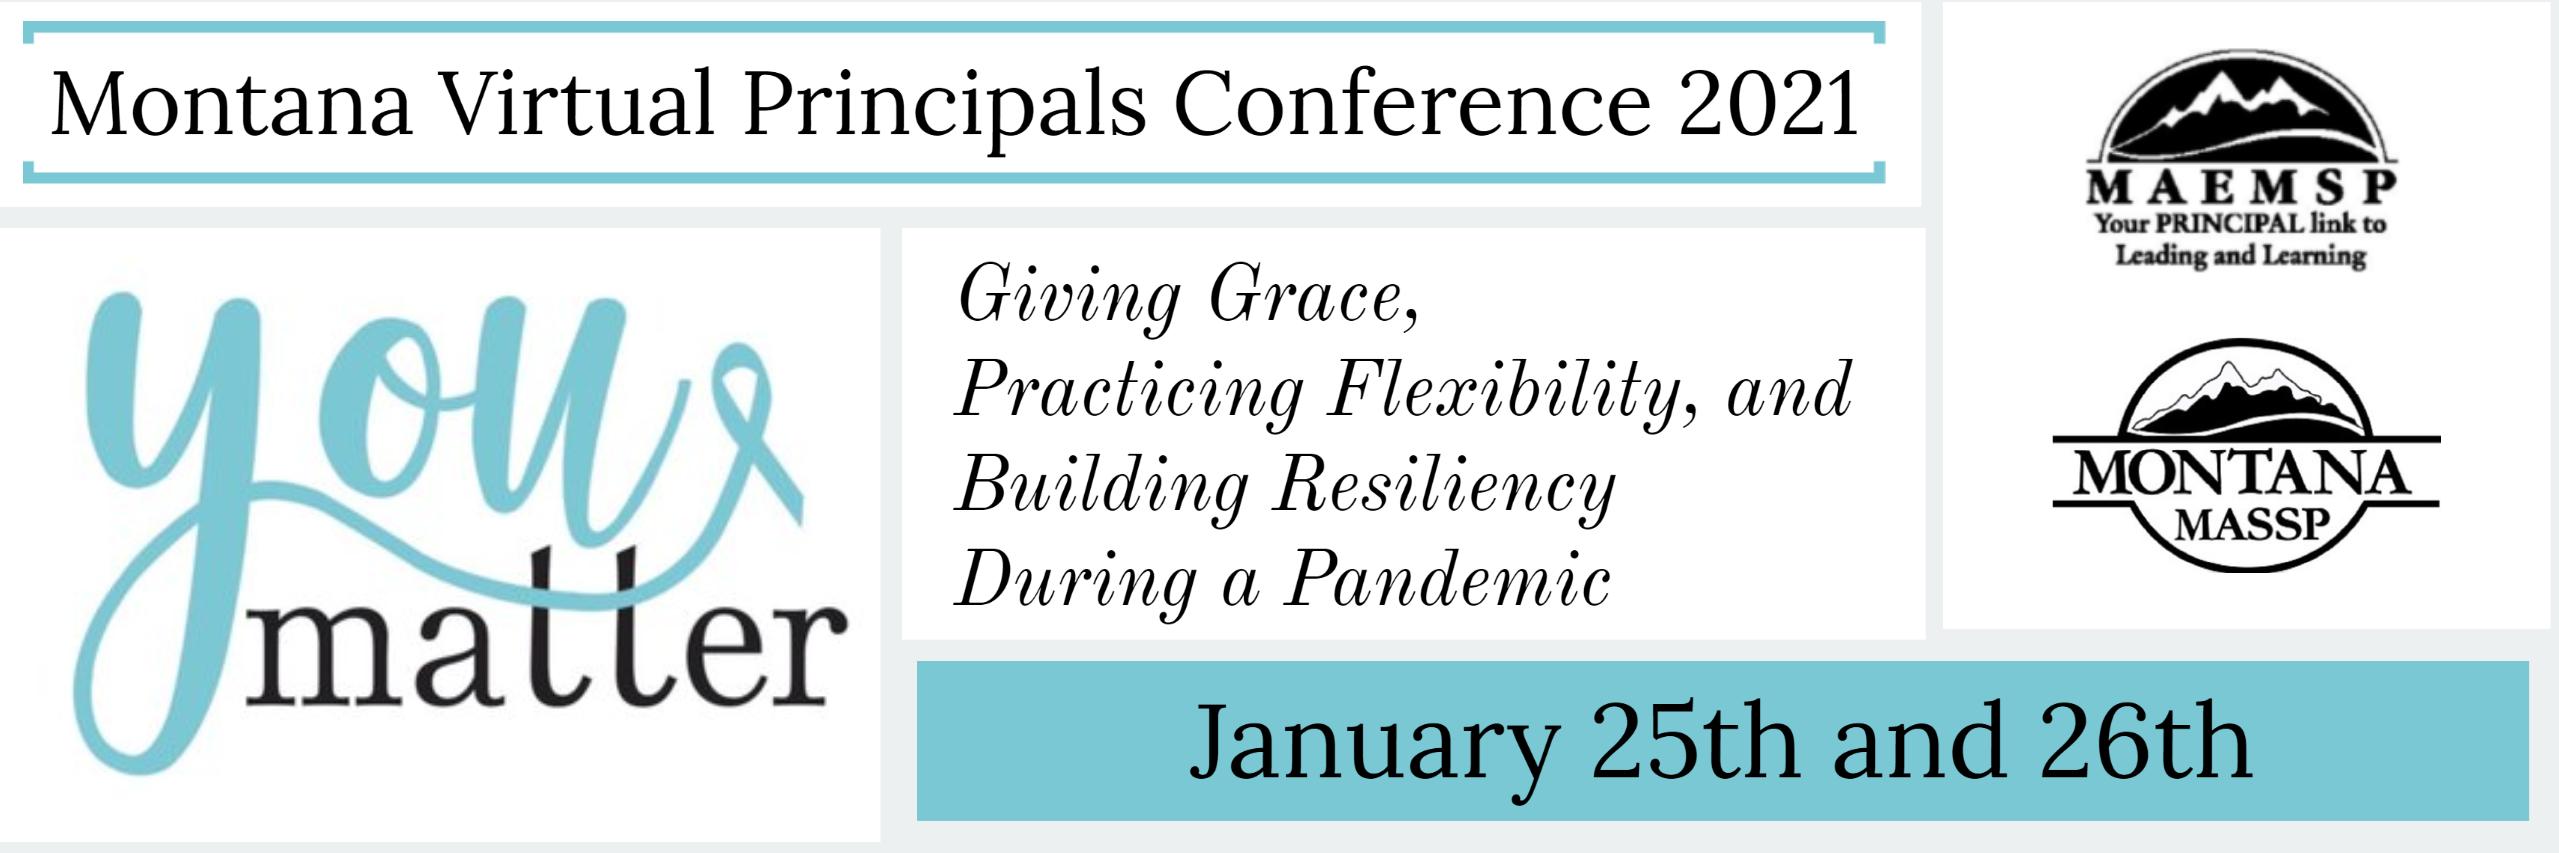 MT_Principals_Conference_2021_Banner.png - 739.45 Kb